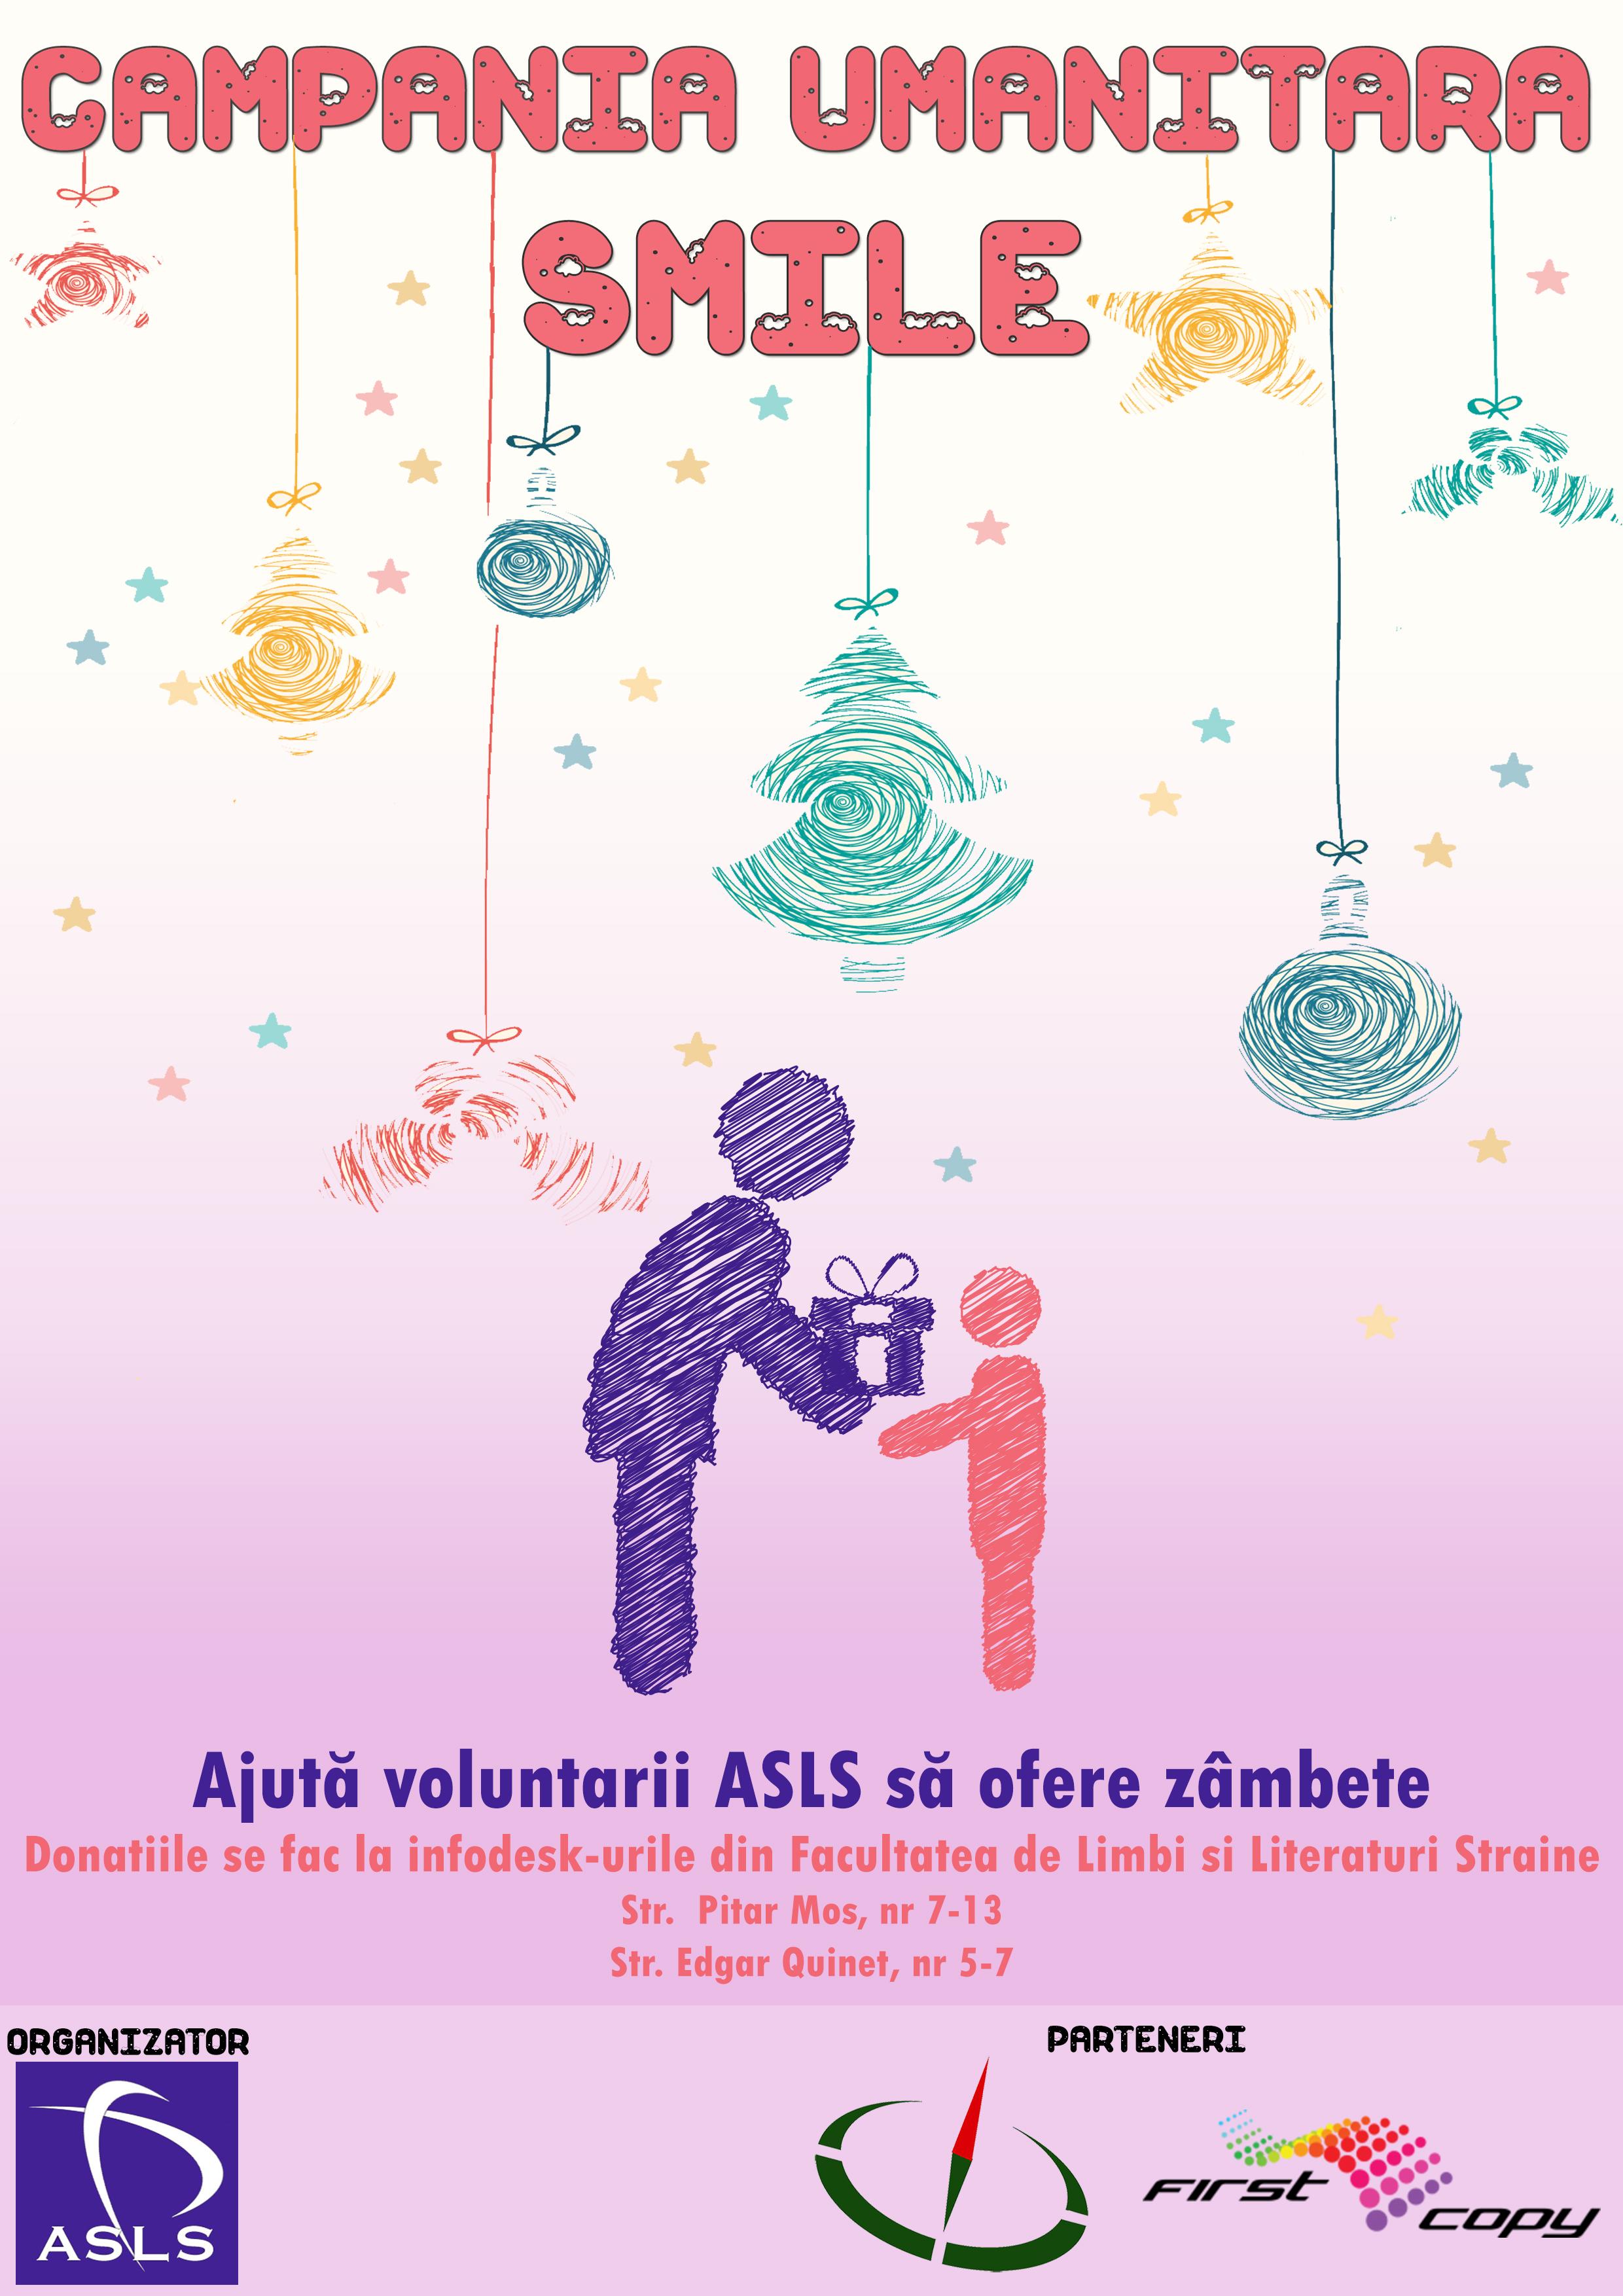 Campania Umanitara SMILE